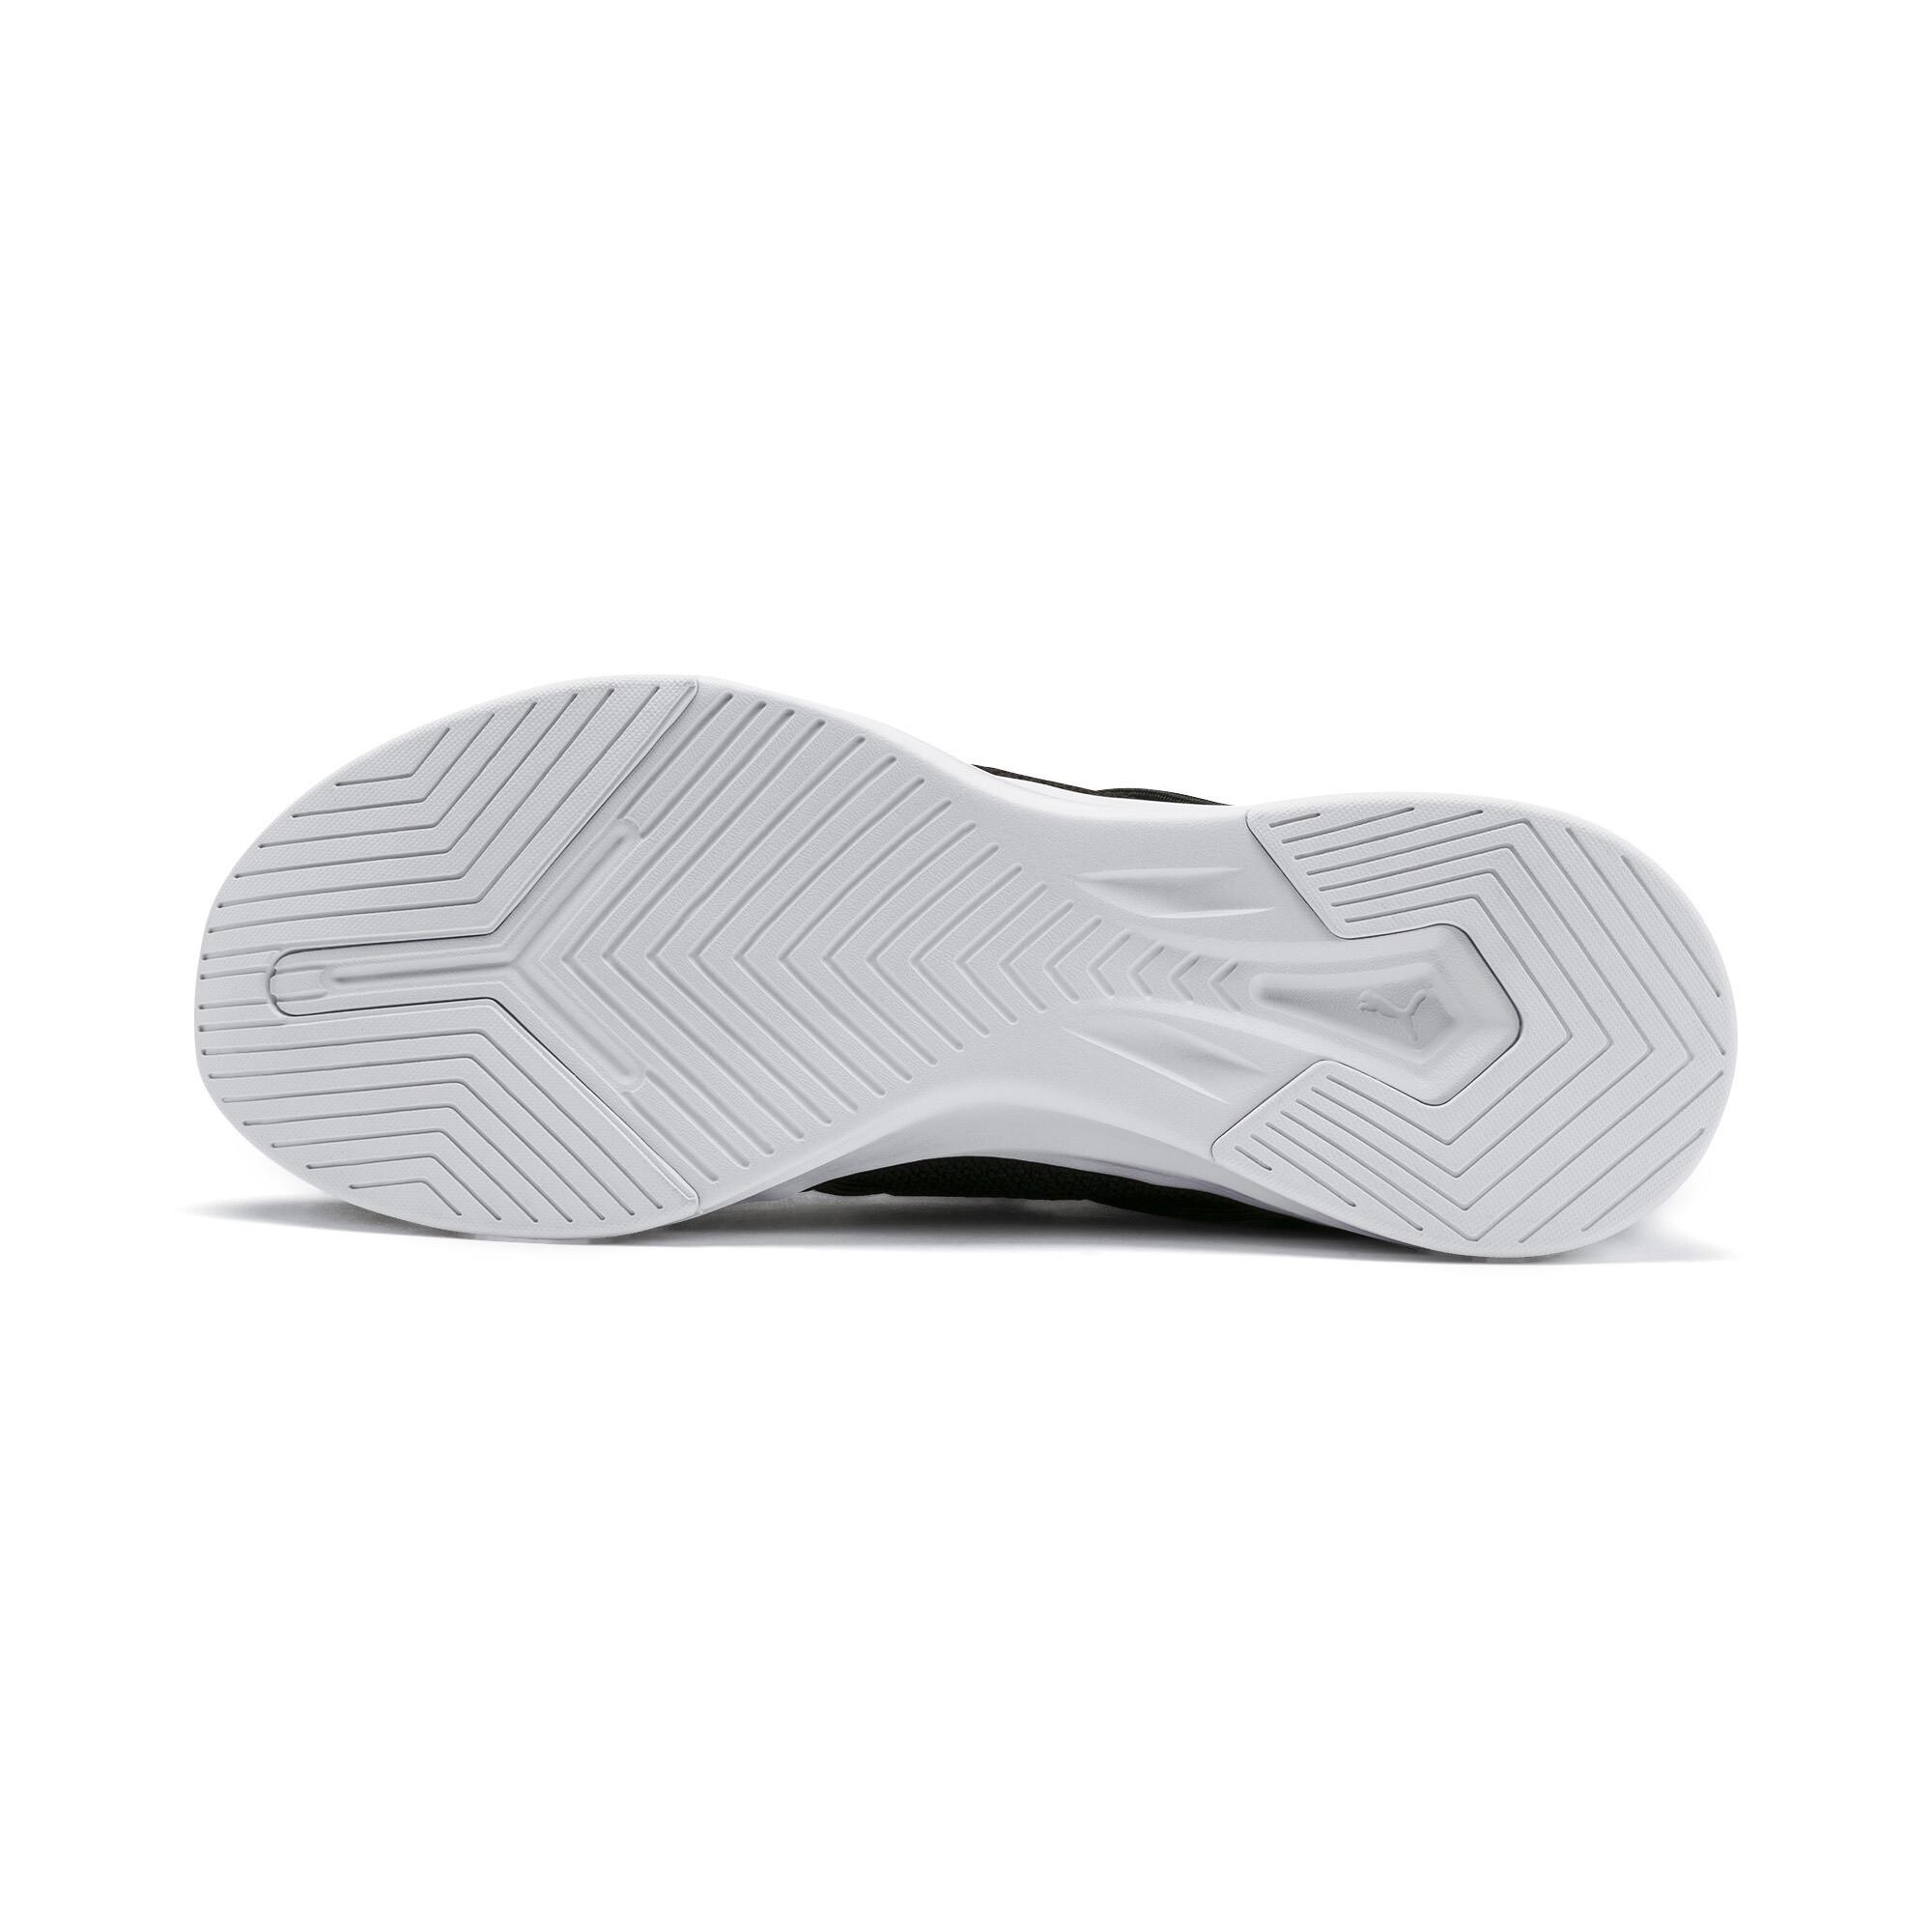 PUMA-Men-039-s-Persist-XT-Knit-Training-Shoes thumbnail 6